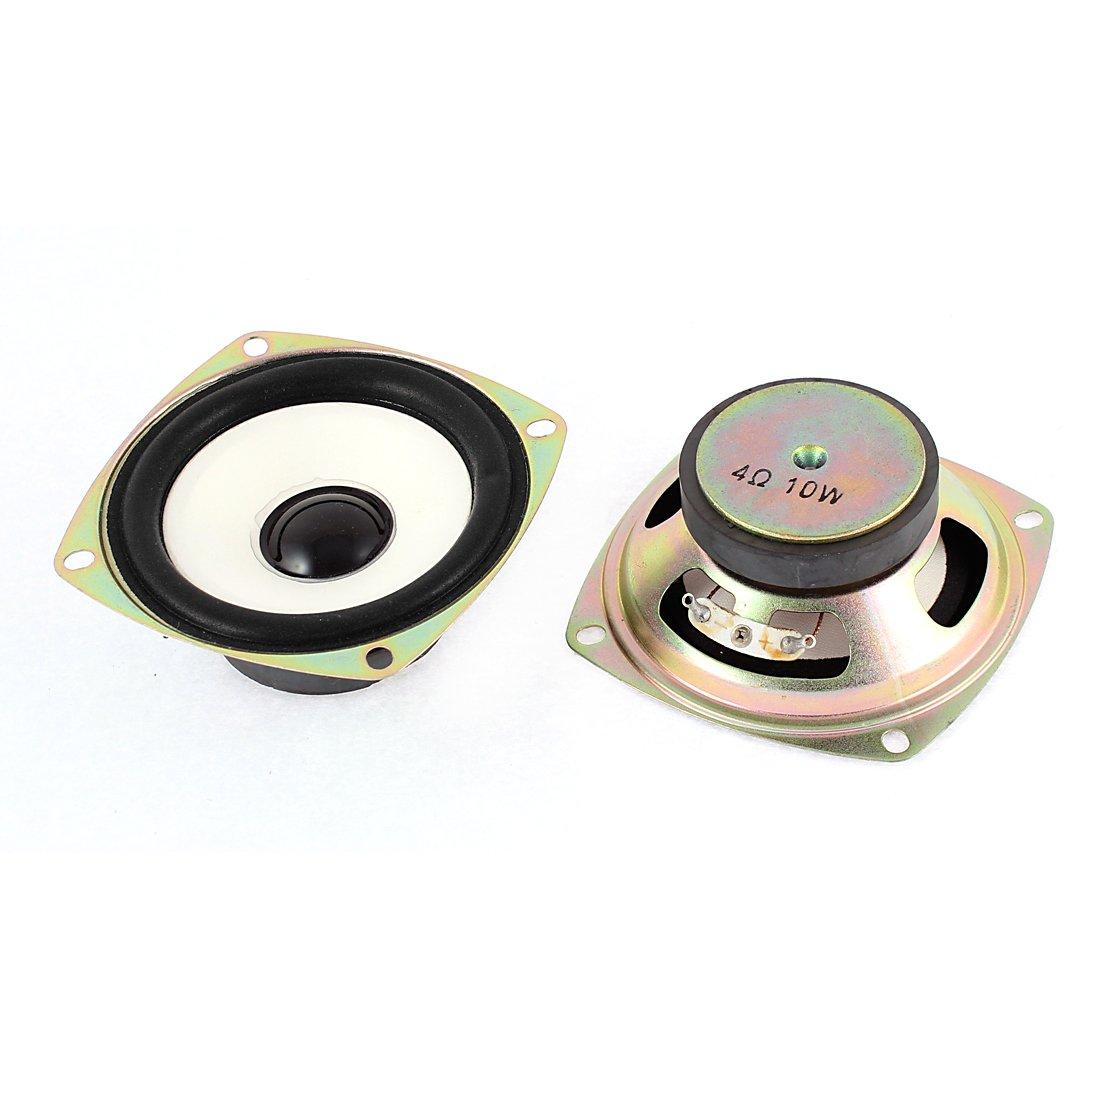 uxcell 10W 4 Ohm External Magnet Speaker Loudspeaker 75mm x 30mm 2Pcs